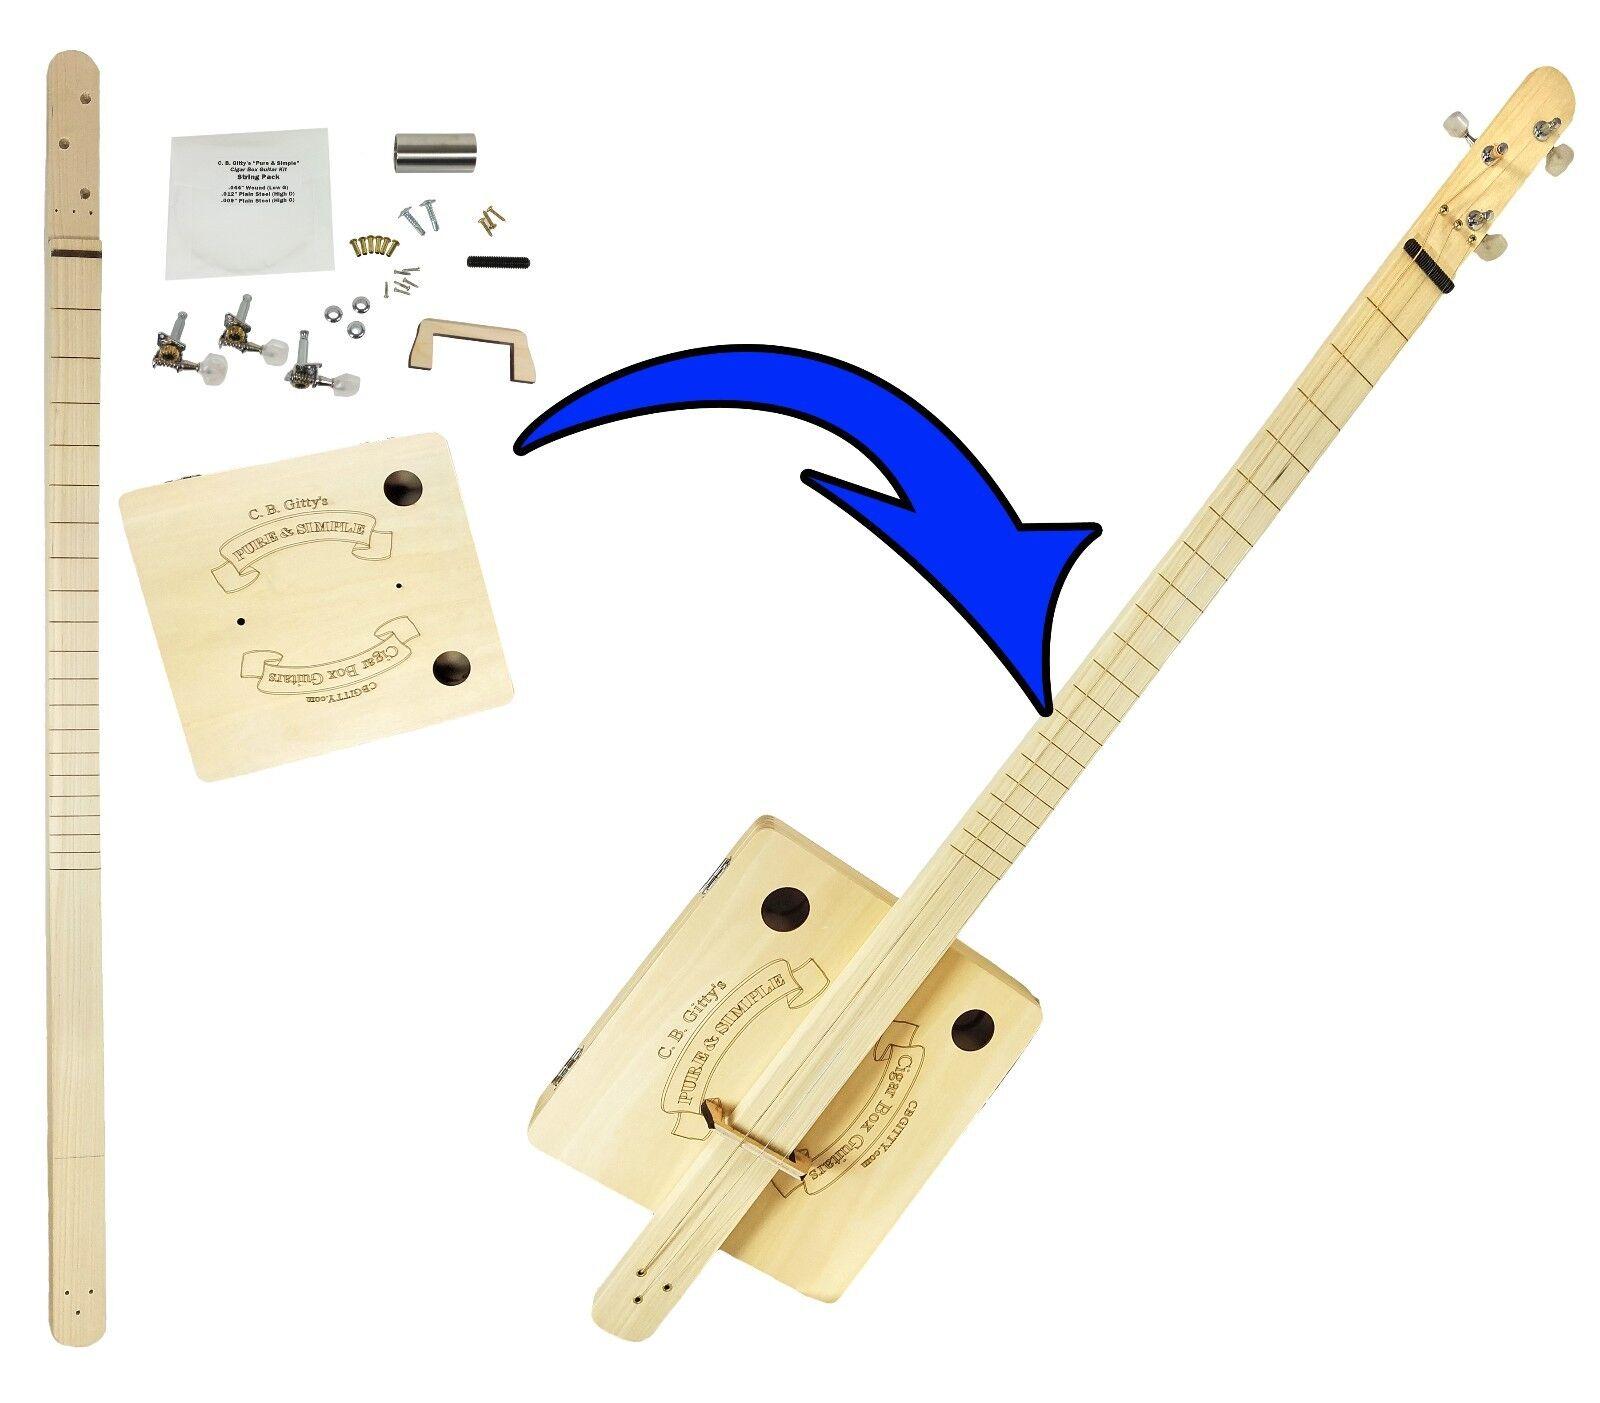 "Easy Assemble Diy Metal Garage Or Shop: ""Pure & Simple"" 3-string SLIDE DIY Cigar Box Guitar Kit"